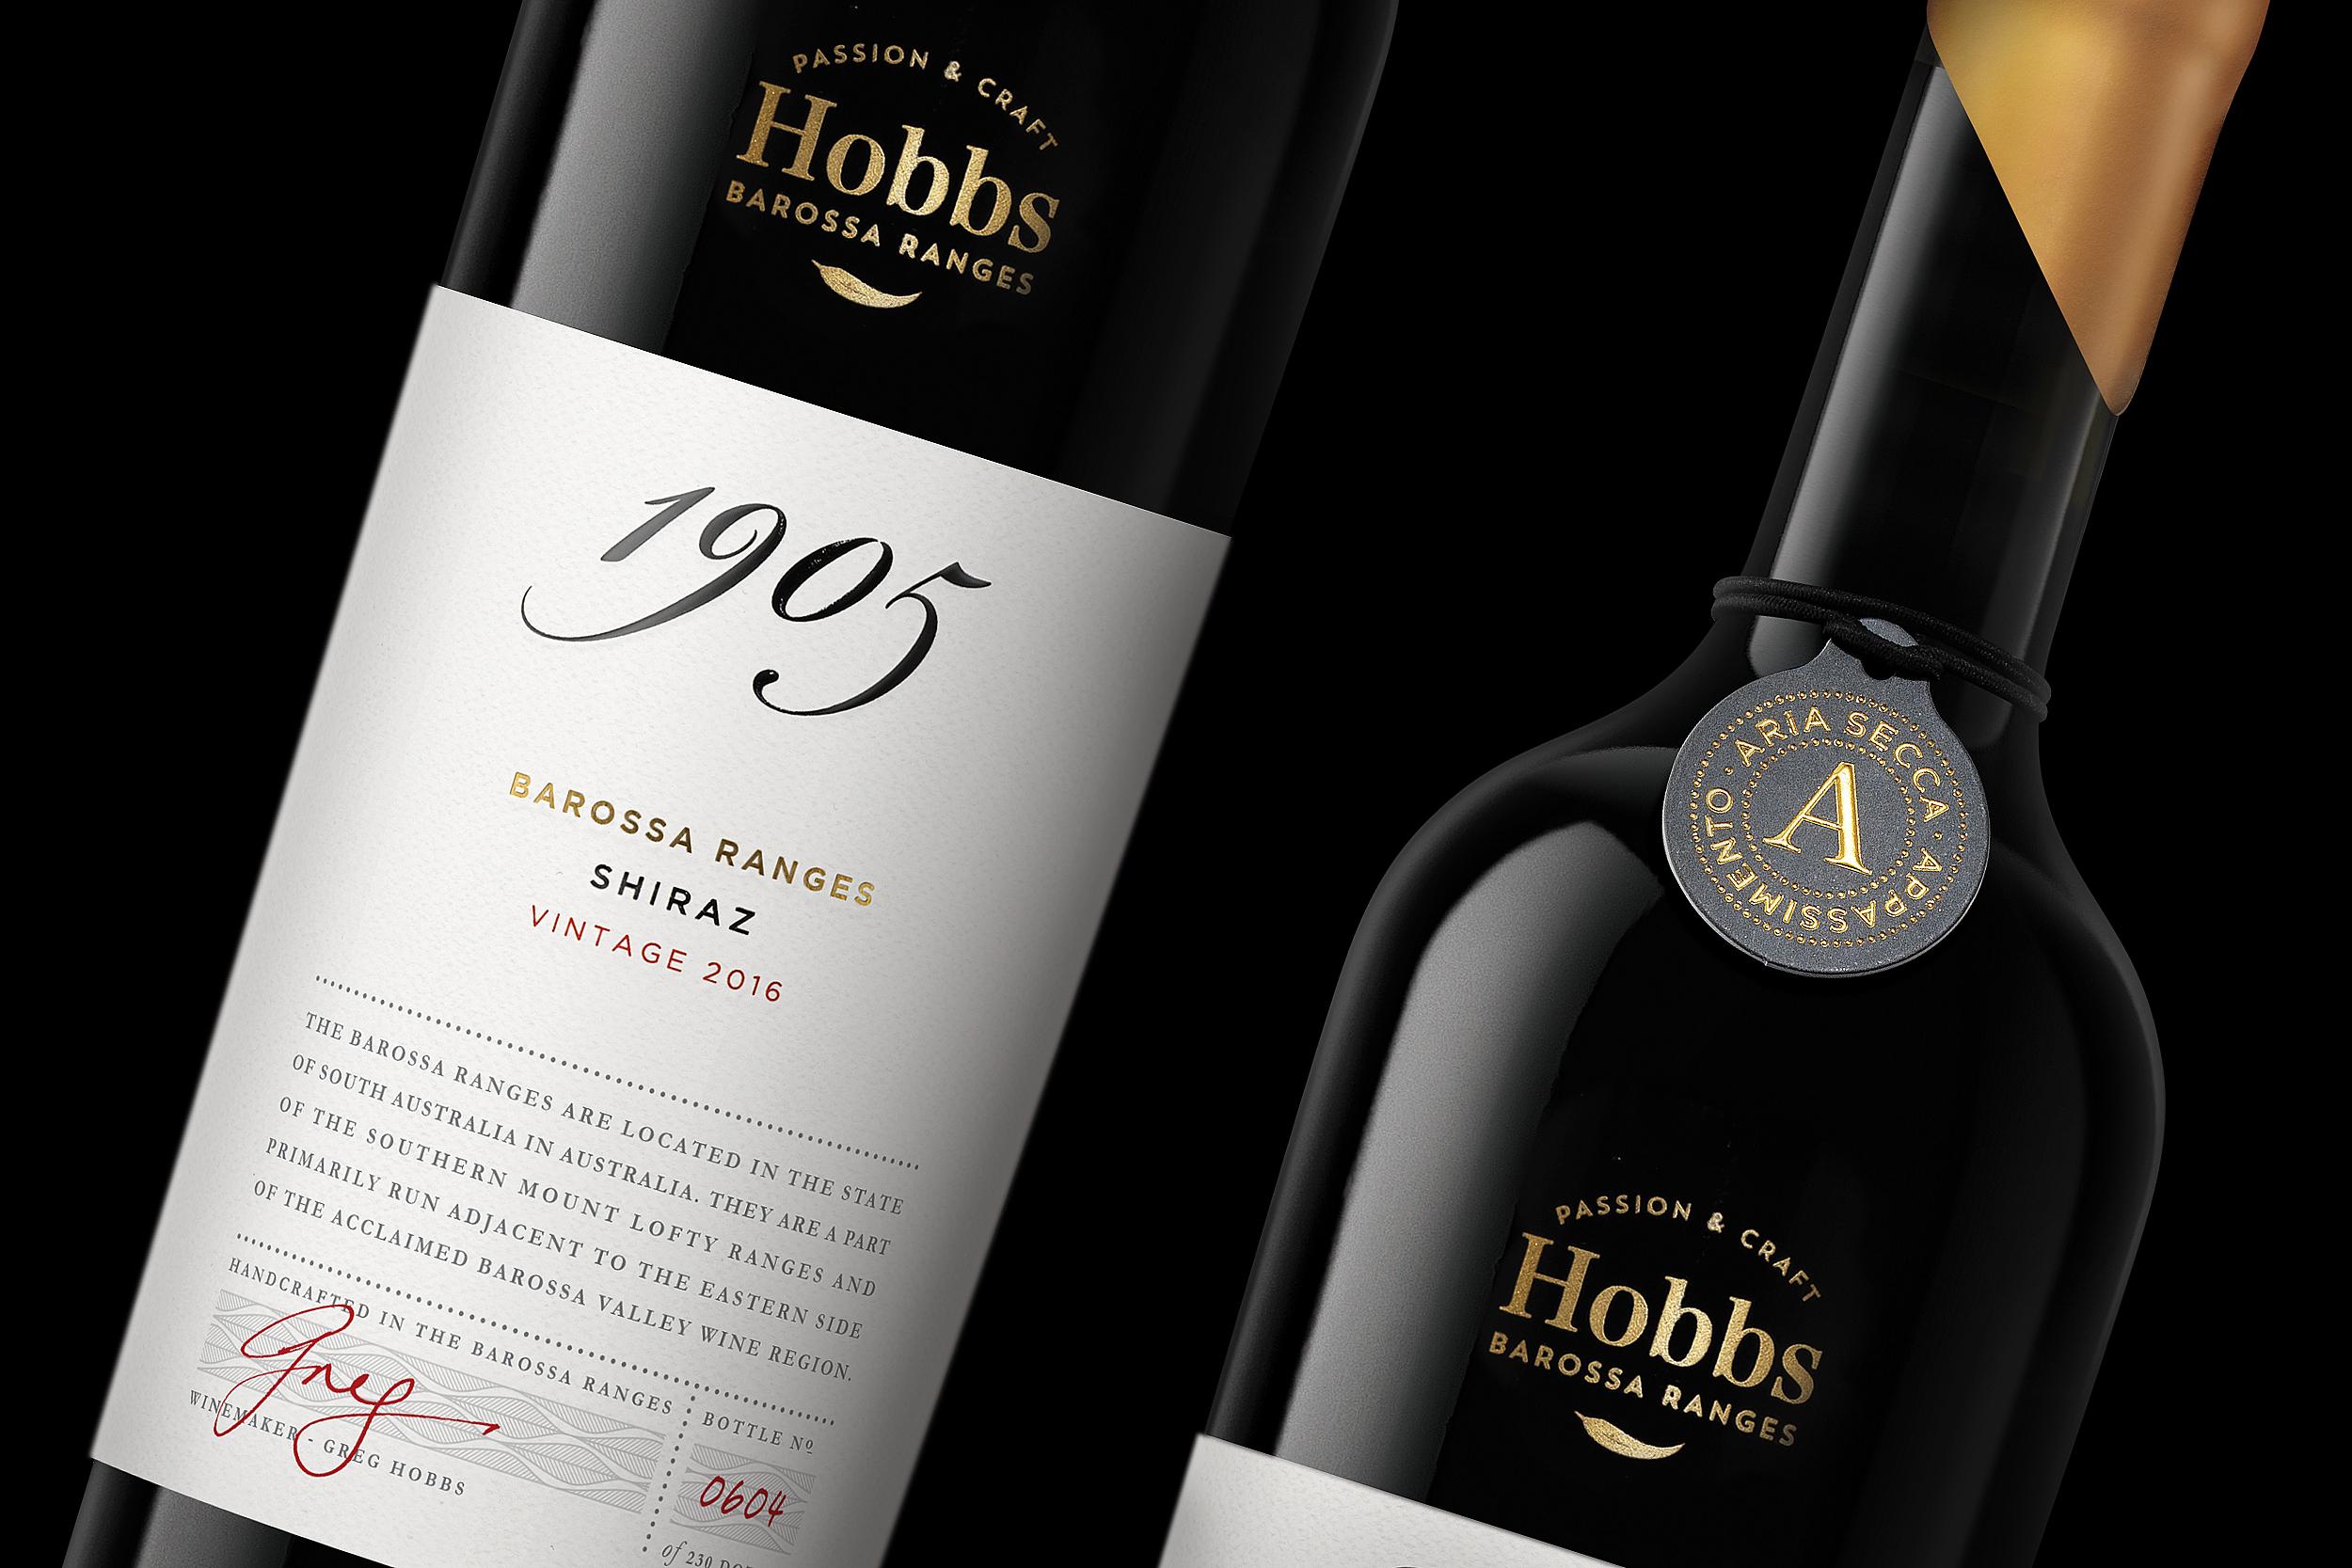 Harcus-Hobbs-Closeup-04.jpg